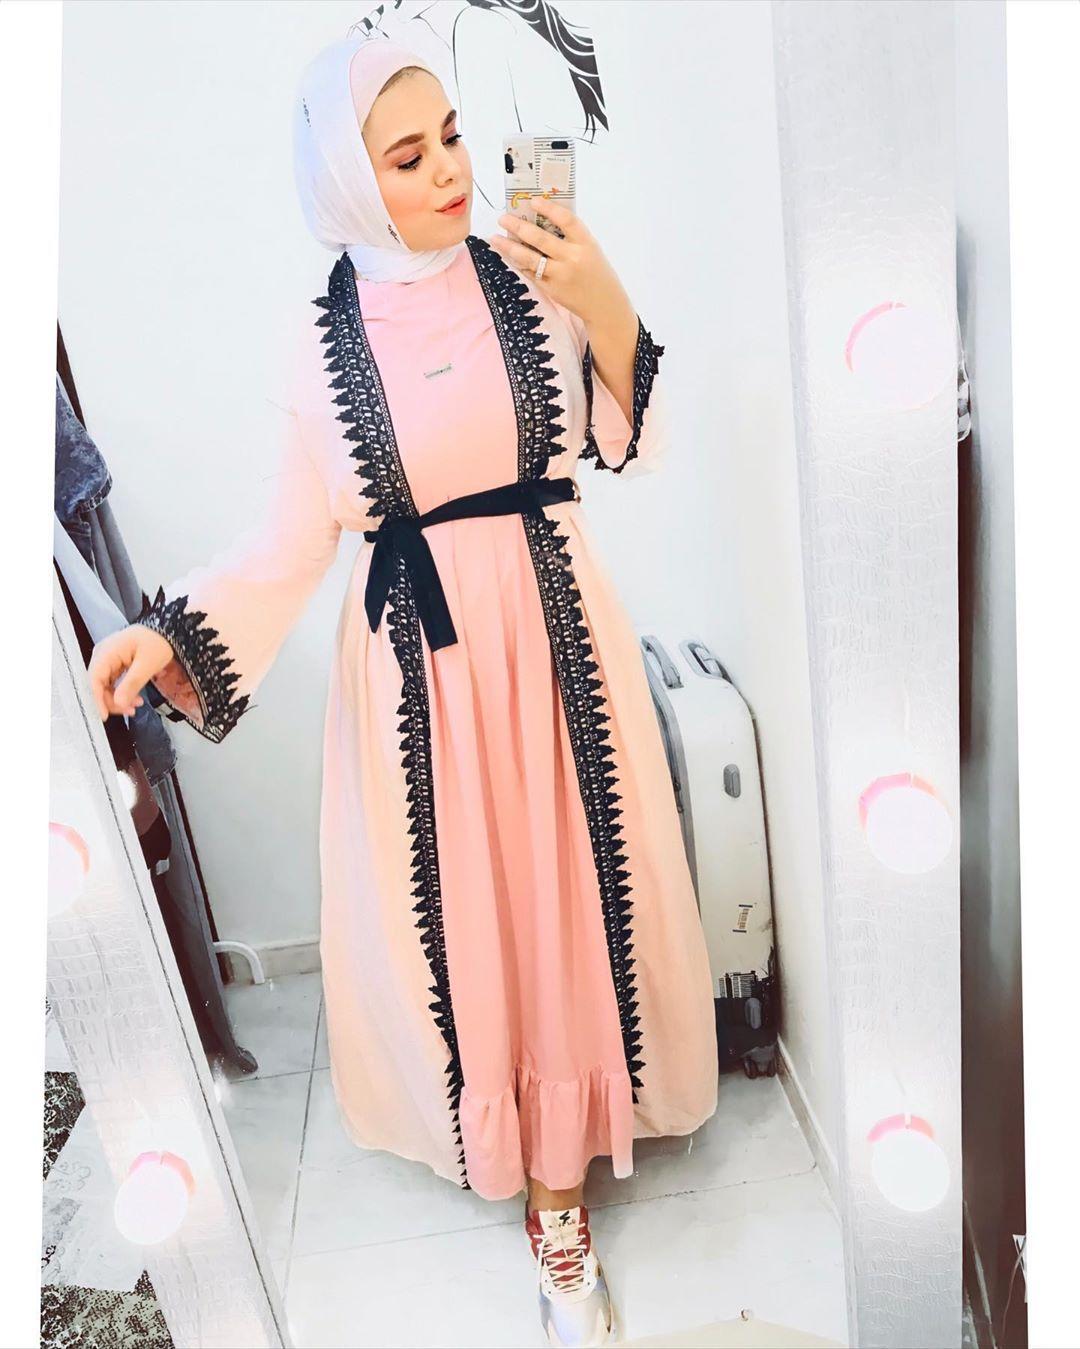 Nouran Elnady نوران النادي Shared A Post On Instagram Good Night قررت اجمع بين العباية والدريس وقد كان هنزلكو الديتيل Wrap Dress Fashion Dresses